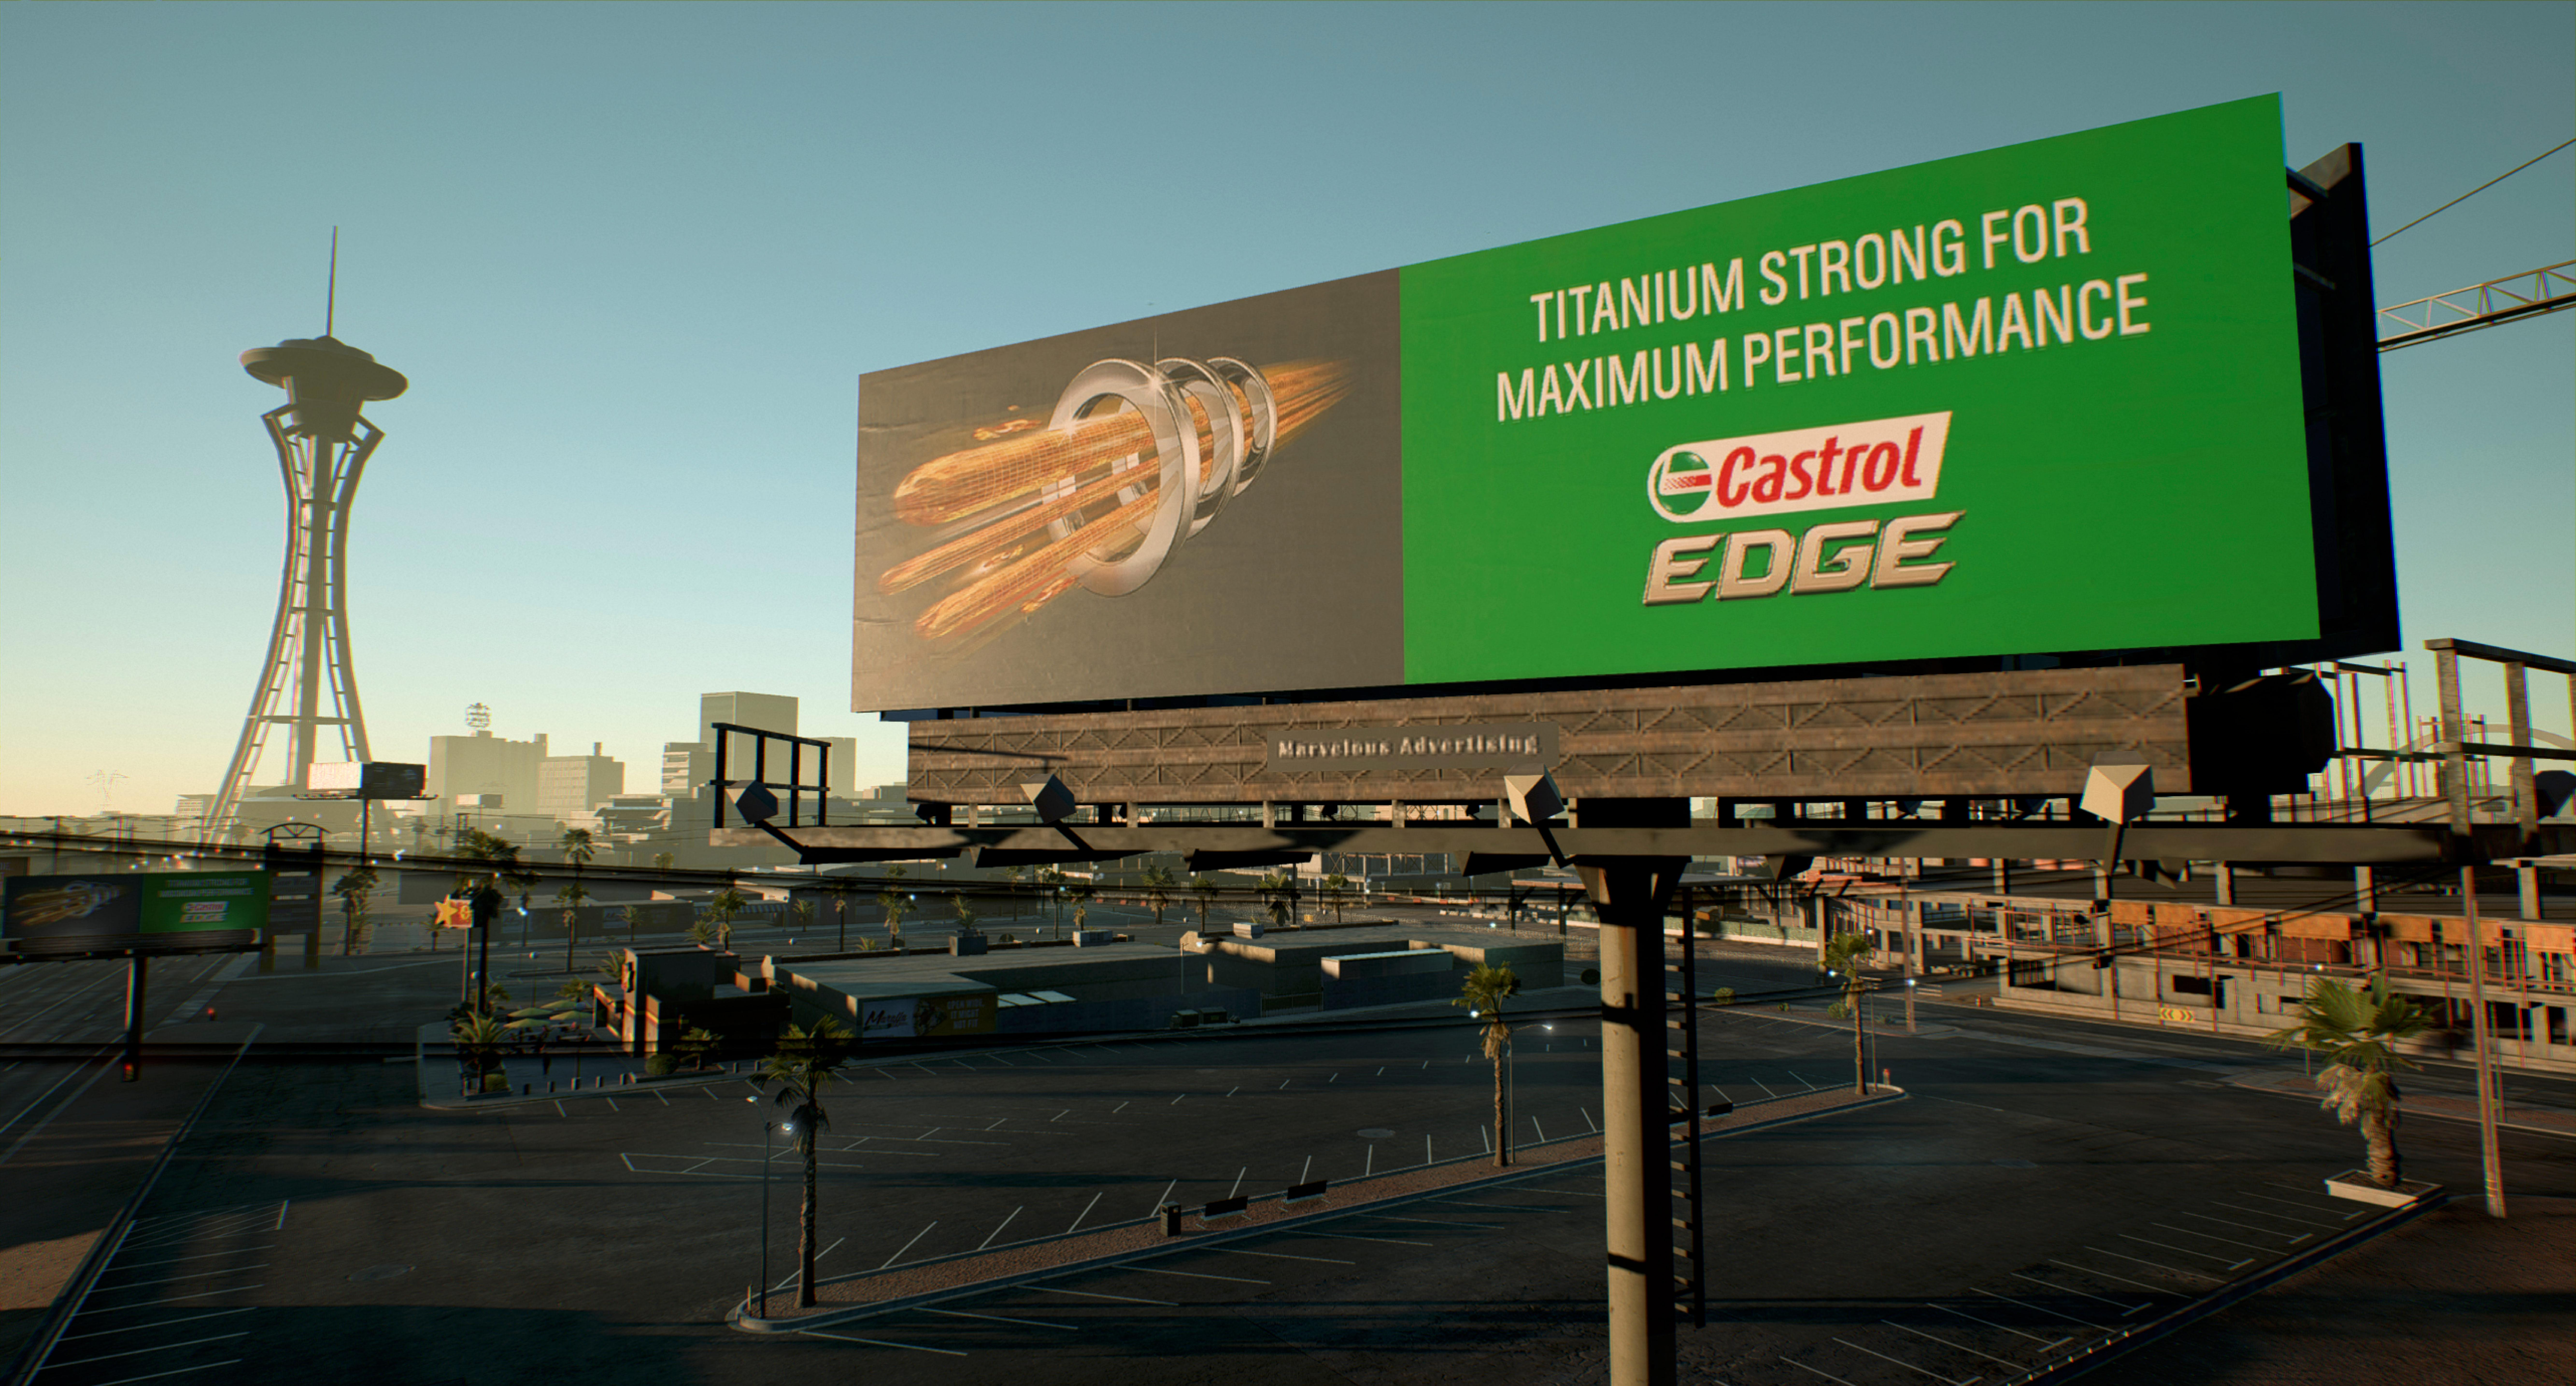 castrol-nfs-billboard.jpg